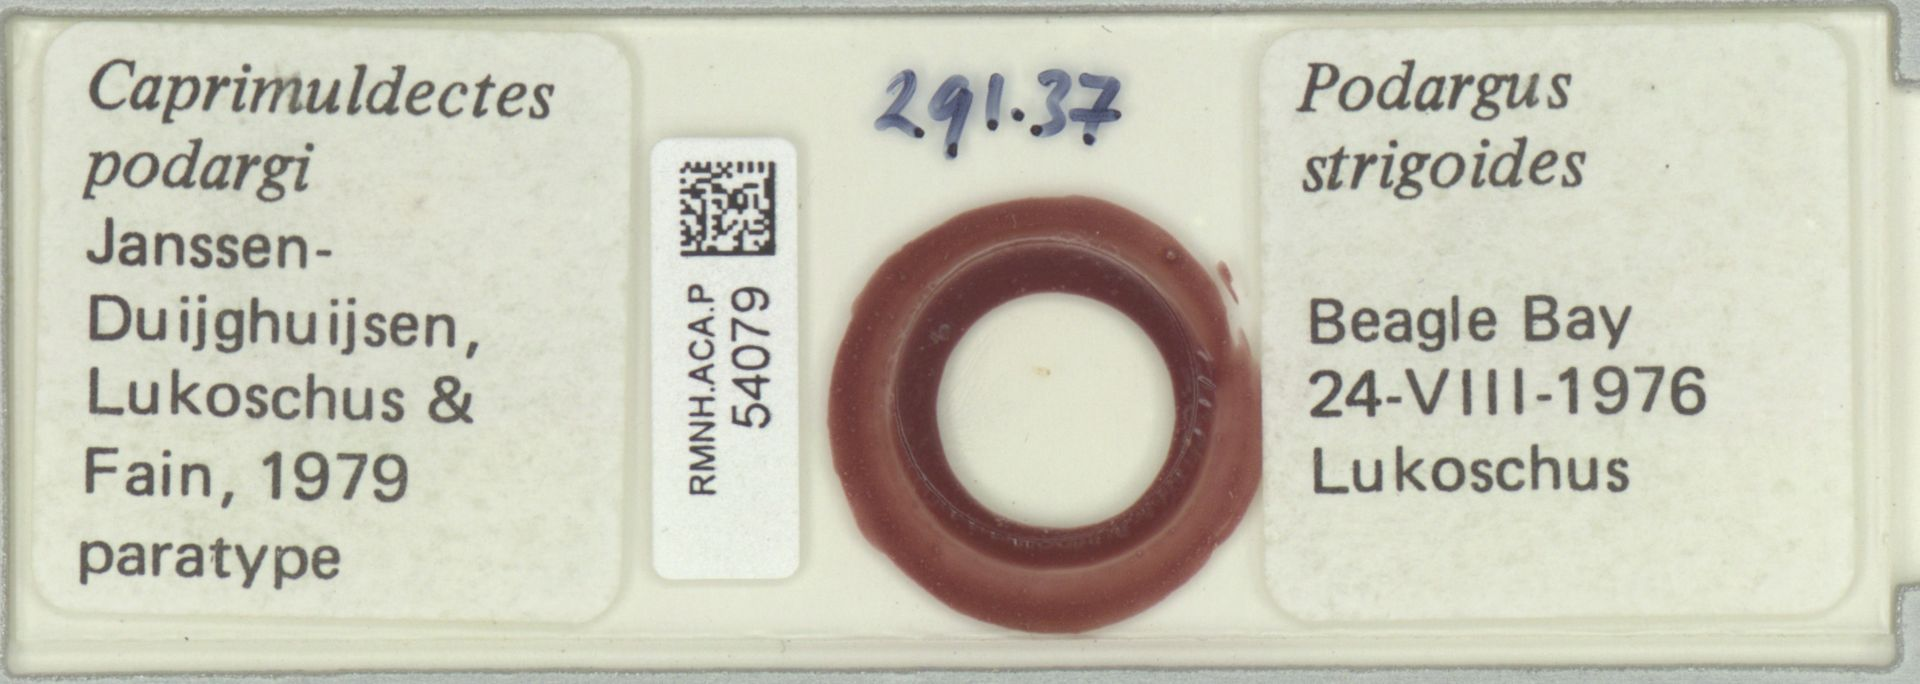 RMNH.ACA.P.54079 | Caprimuldectes podargi Janssen Duijghuisen, Lukoschus & Fain, 1979